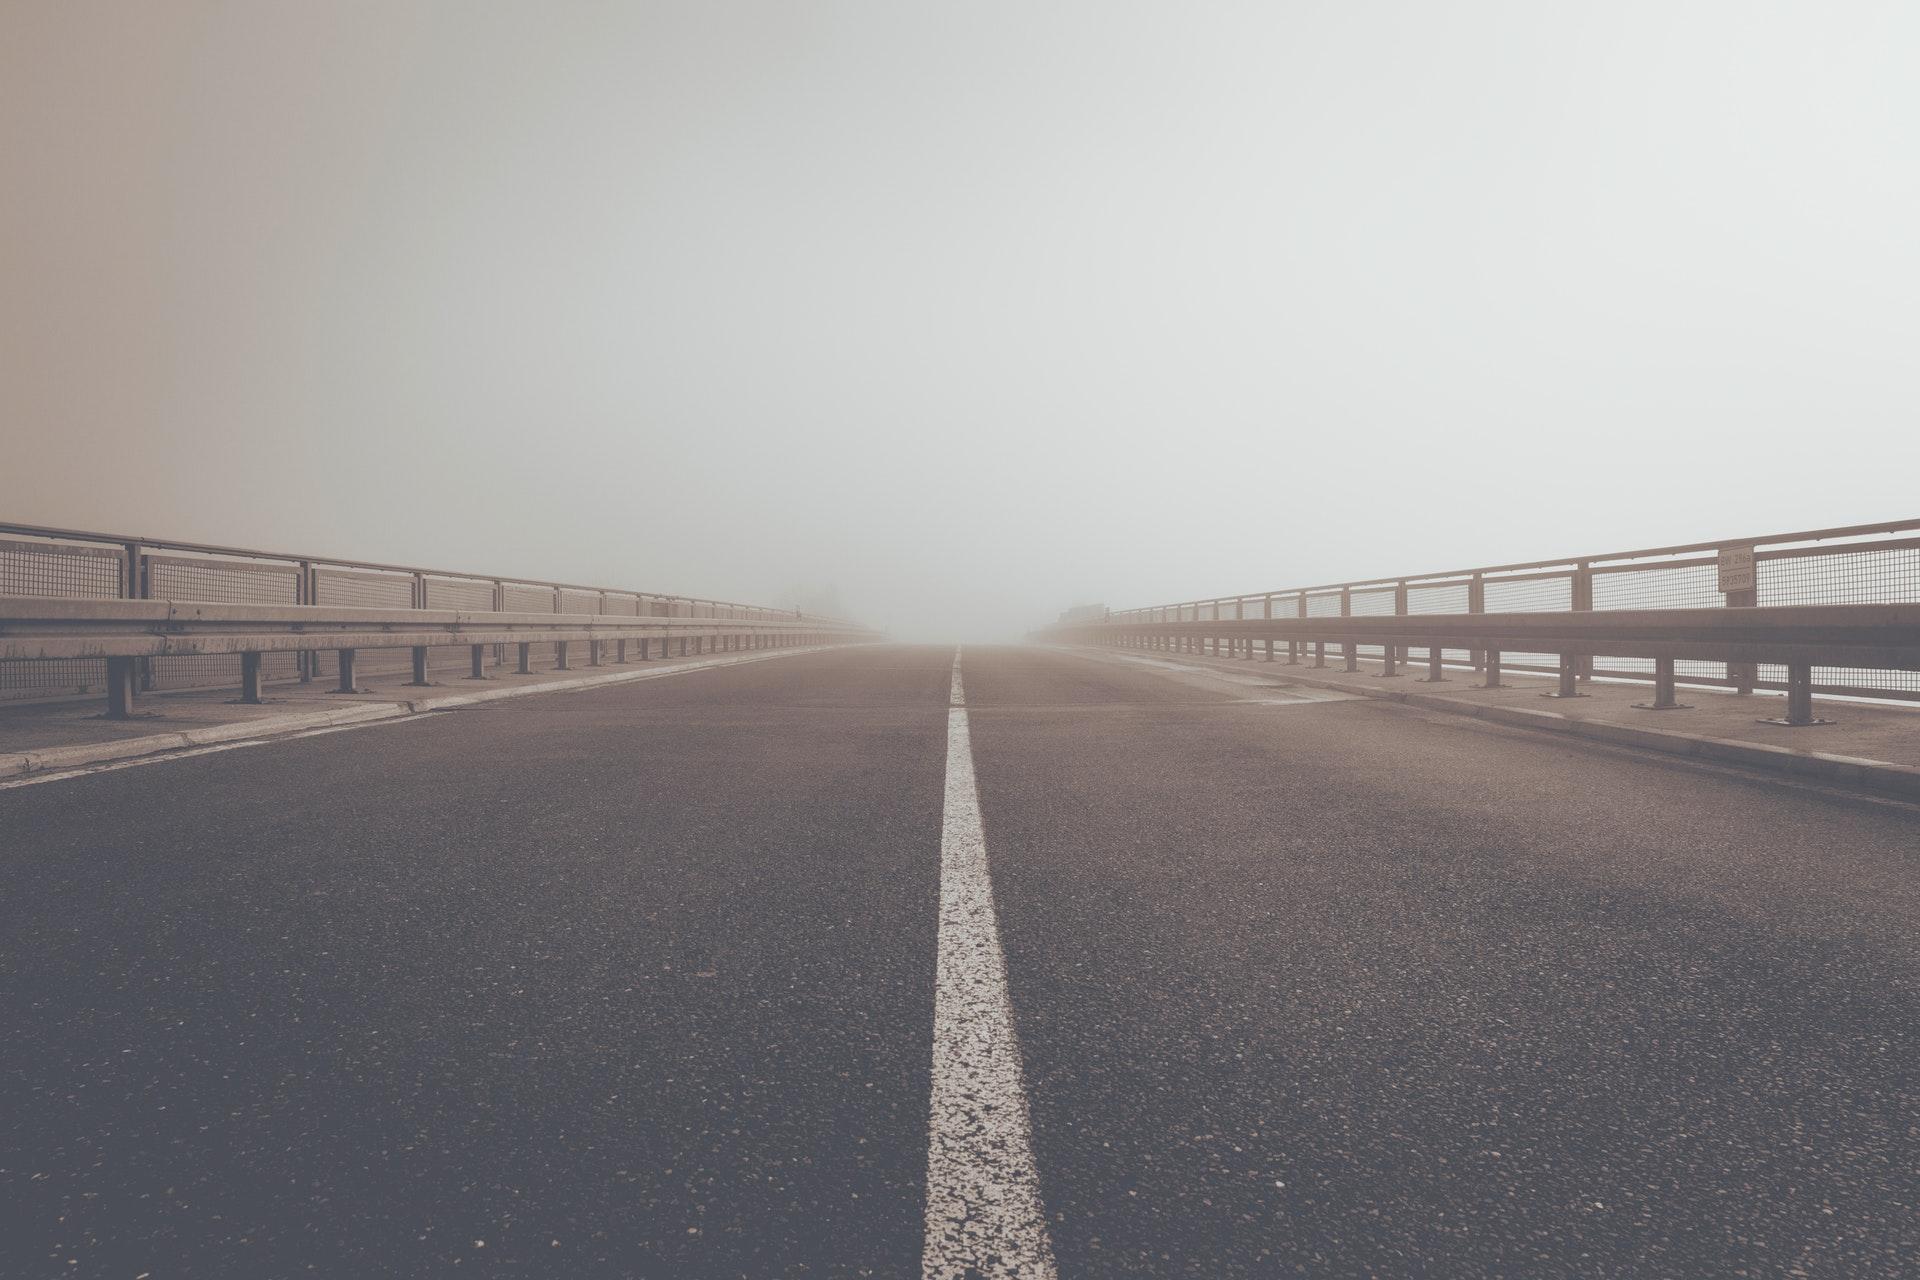 Strada grigia, sempre uguale a se stessa